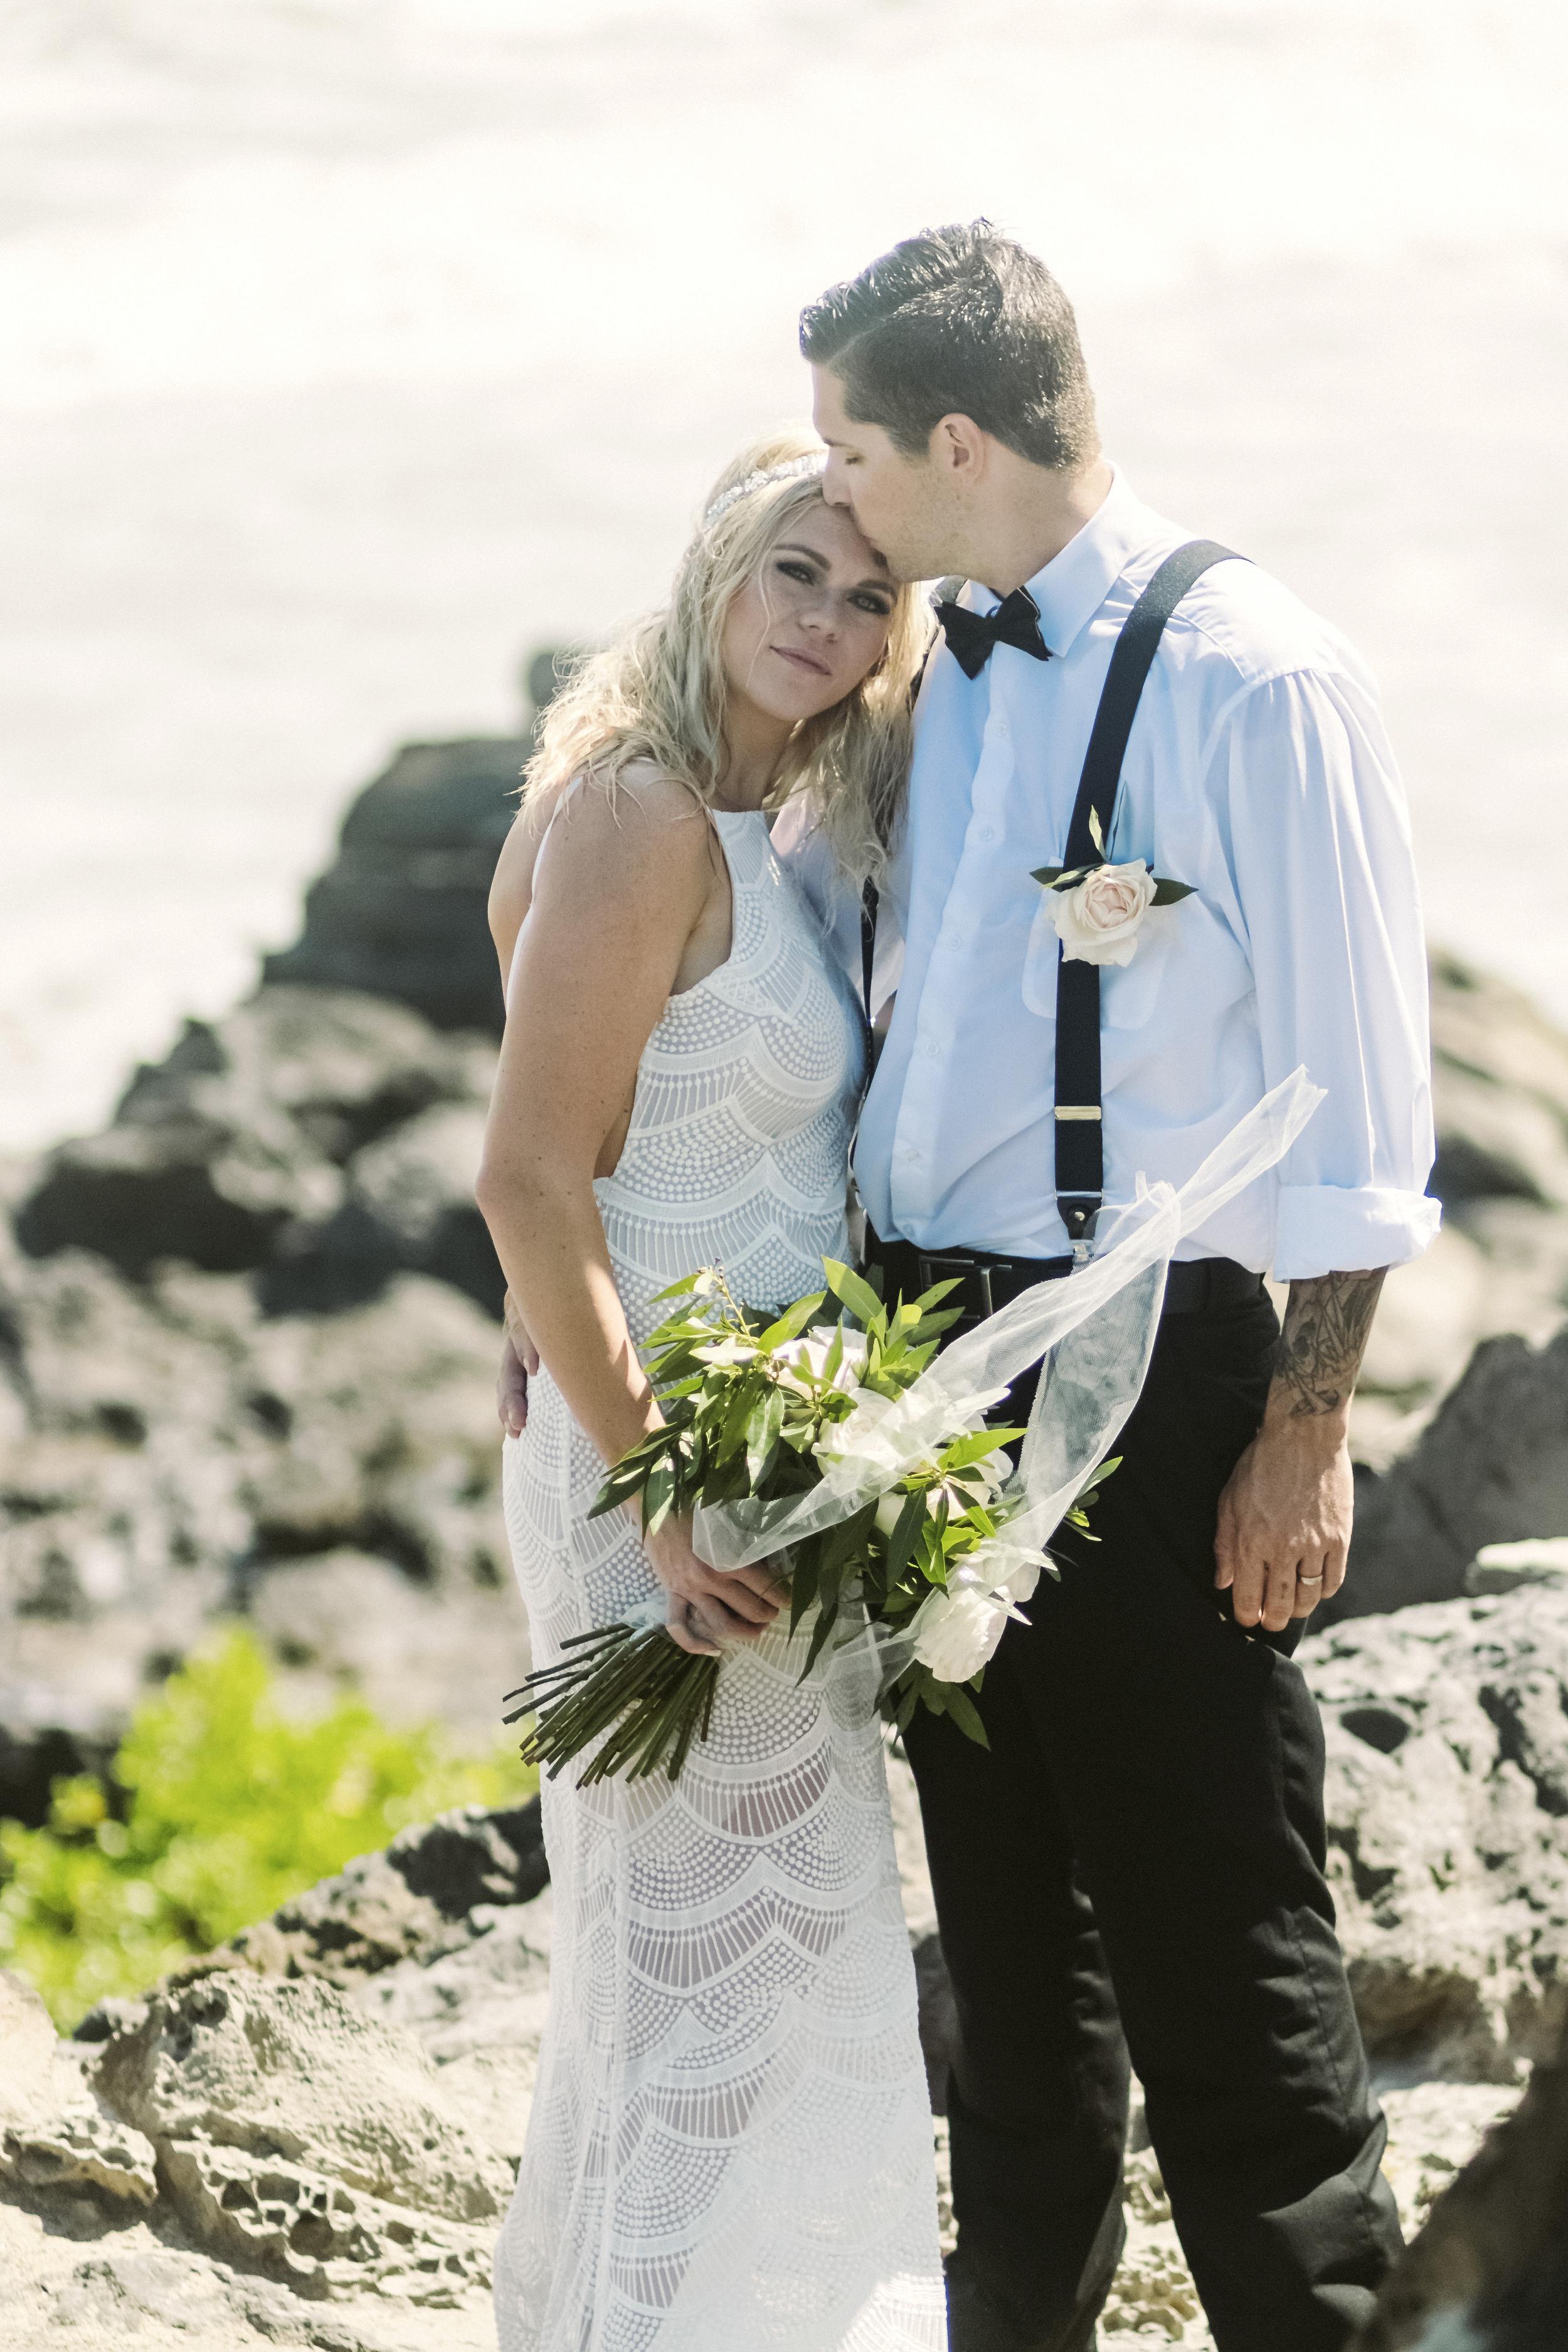 angie-diaz-photography-hawaii-wedding-53.jpg